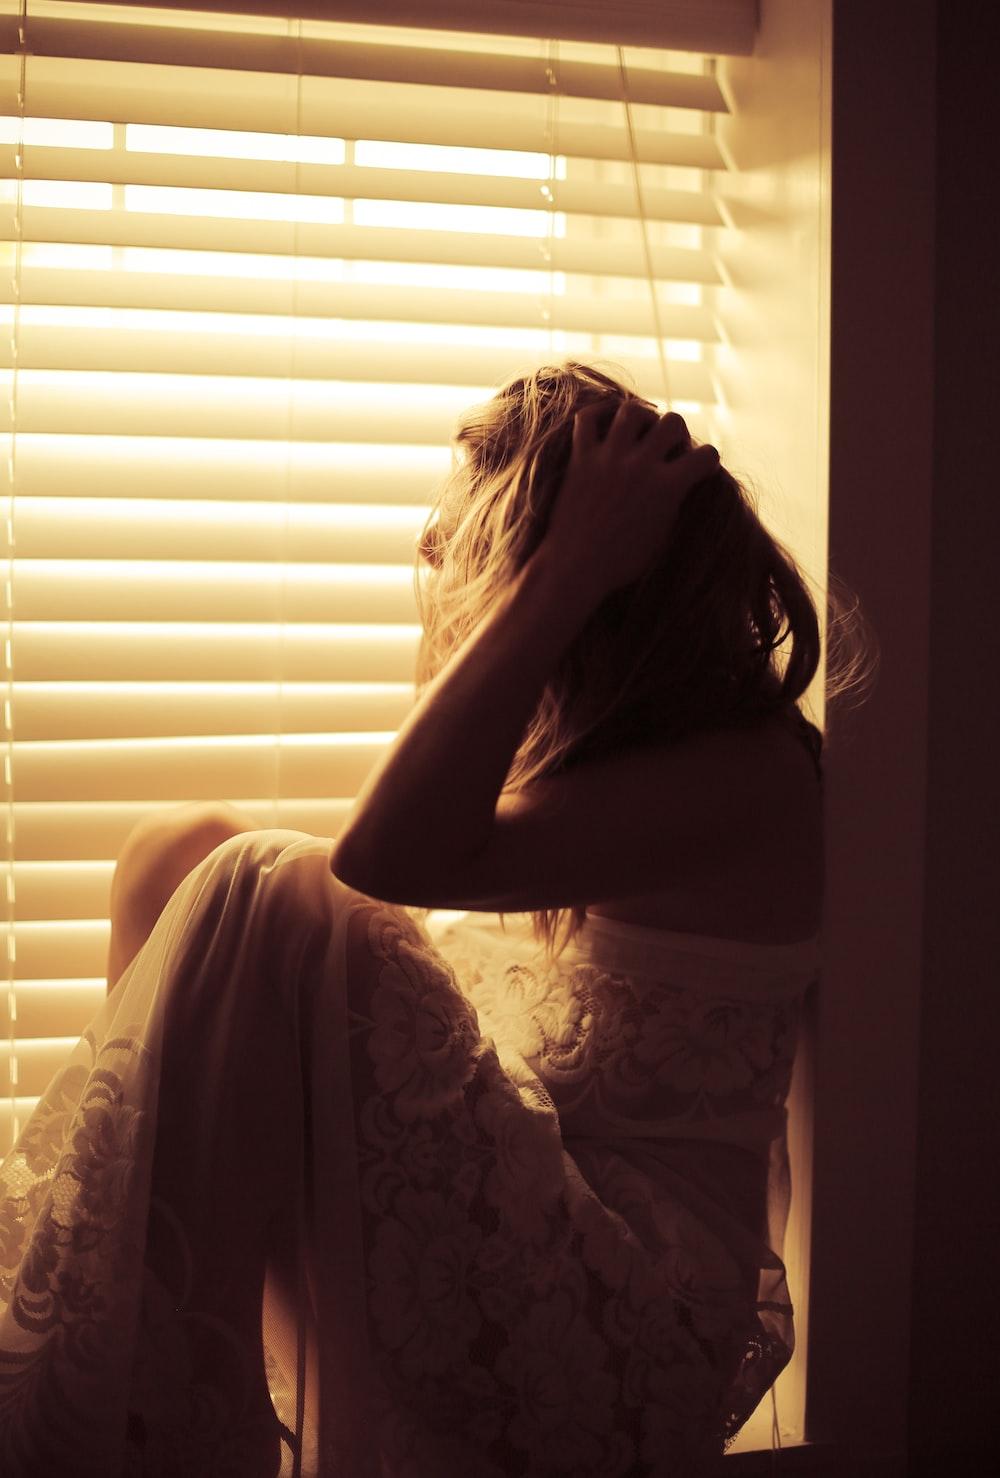 woman in white lace dress sitting beside window blinds